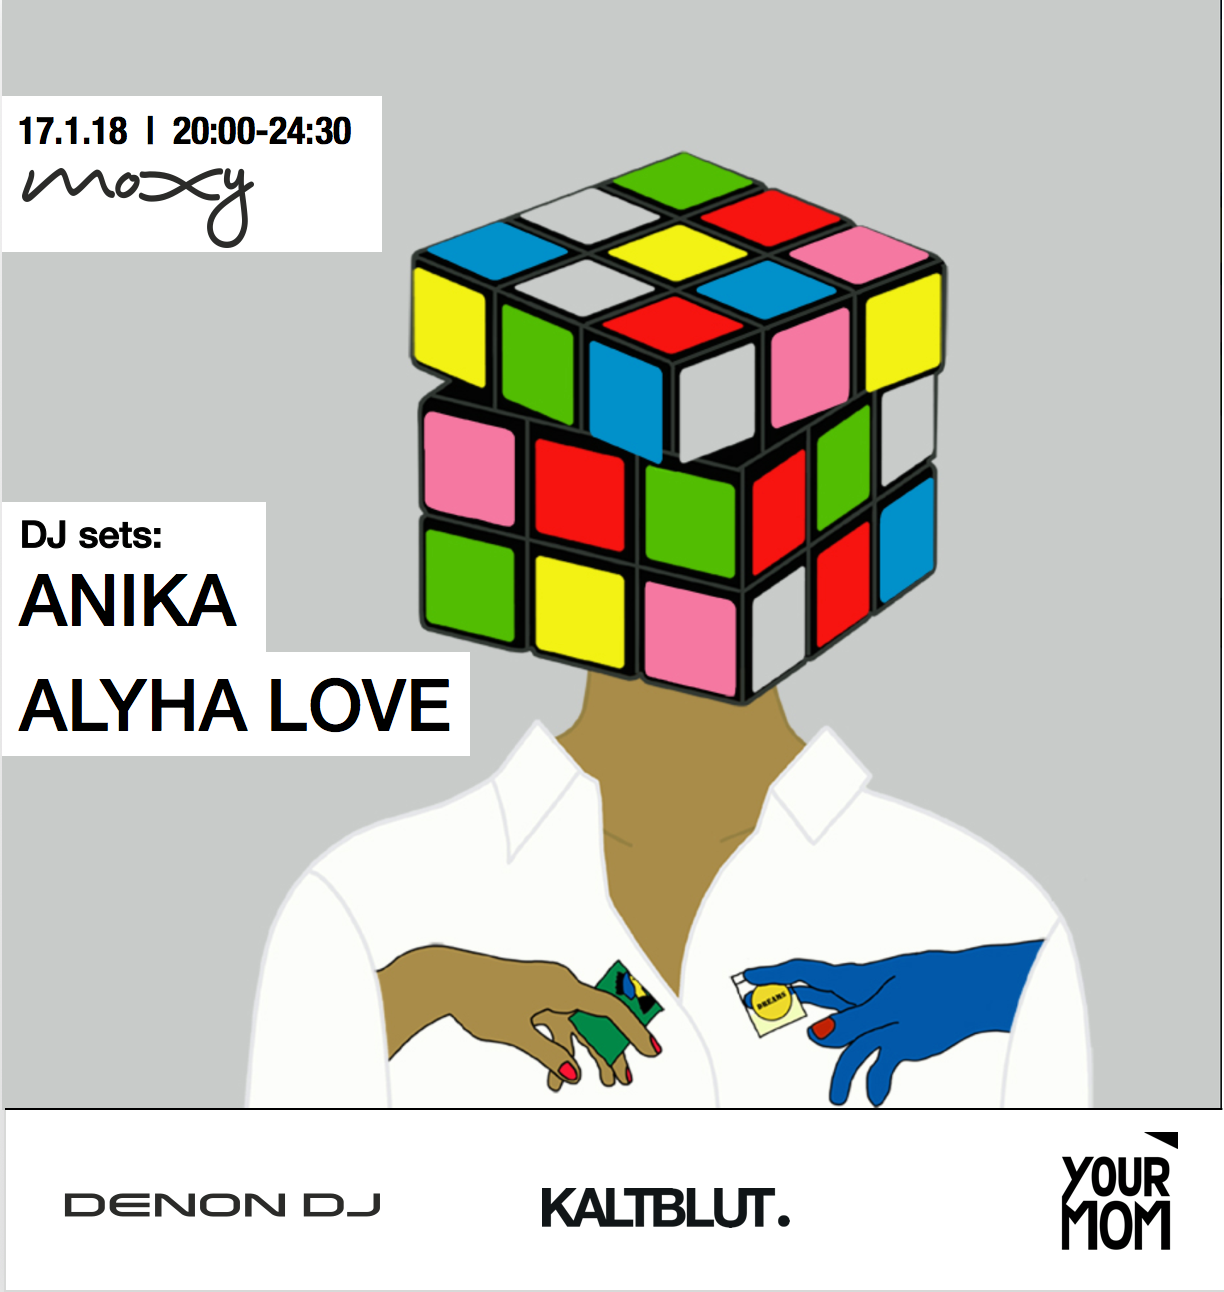 You are invited to  Denon DJ 's Fashion Week evening  #atthemoxy in partnership with  KALTBLUT Magazine .   DJ sets:  Anika (Stones Throw / Invada) & Alyha Love (New World Dysorder)